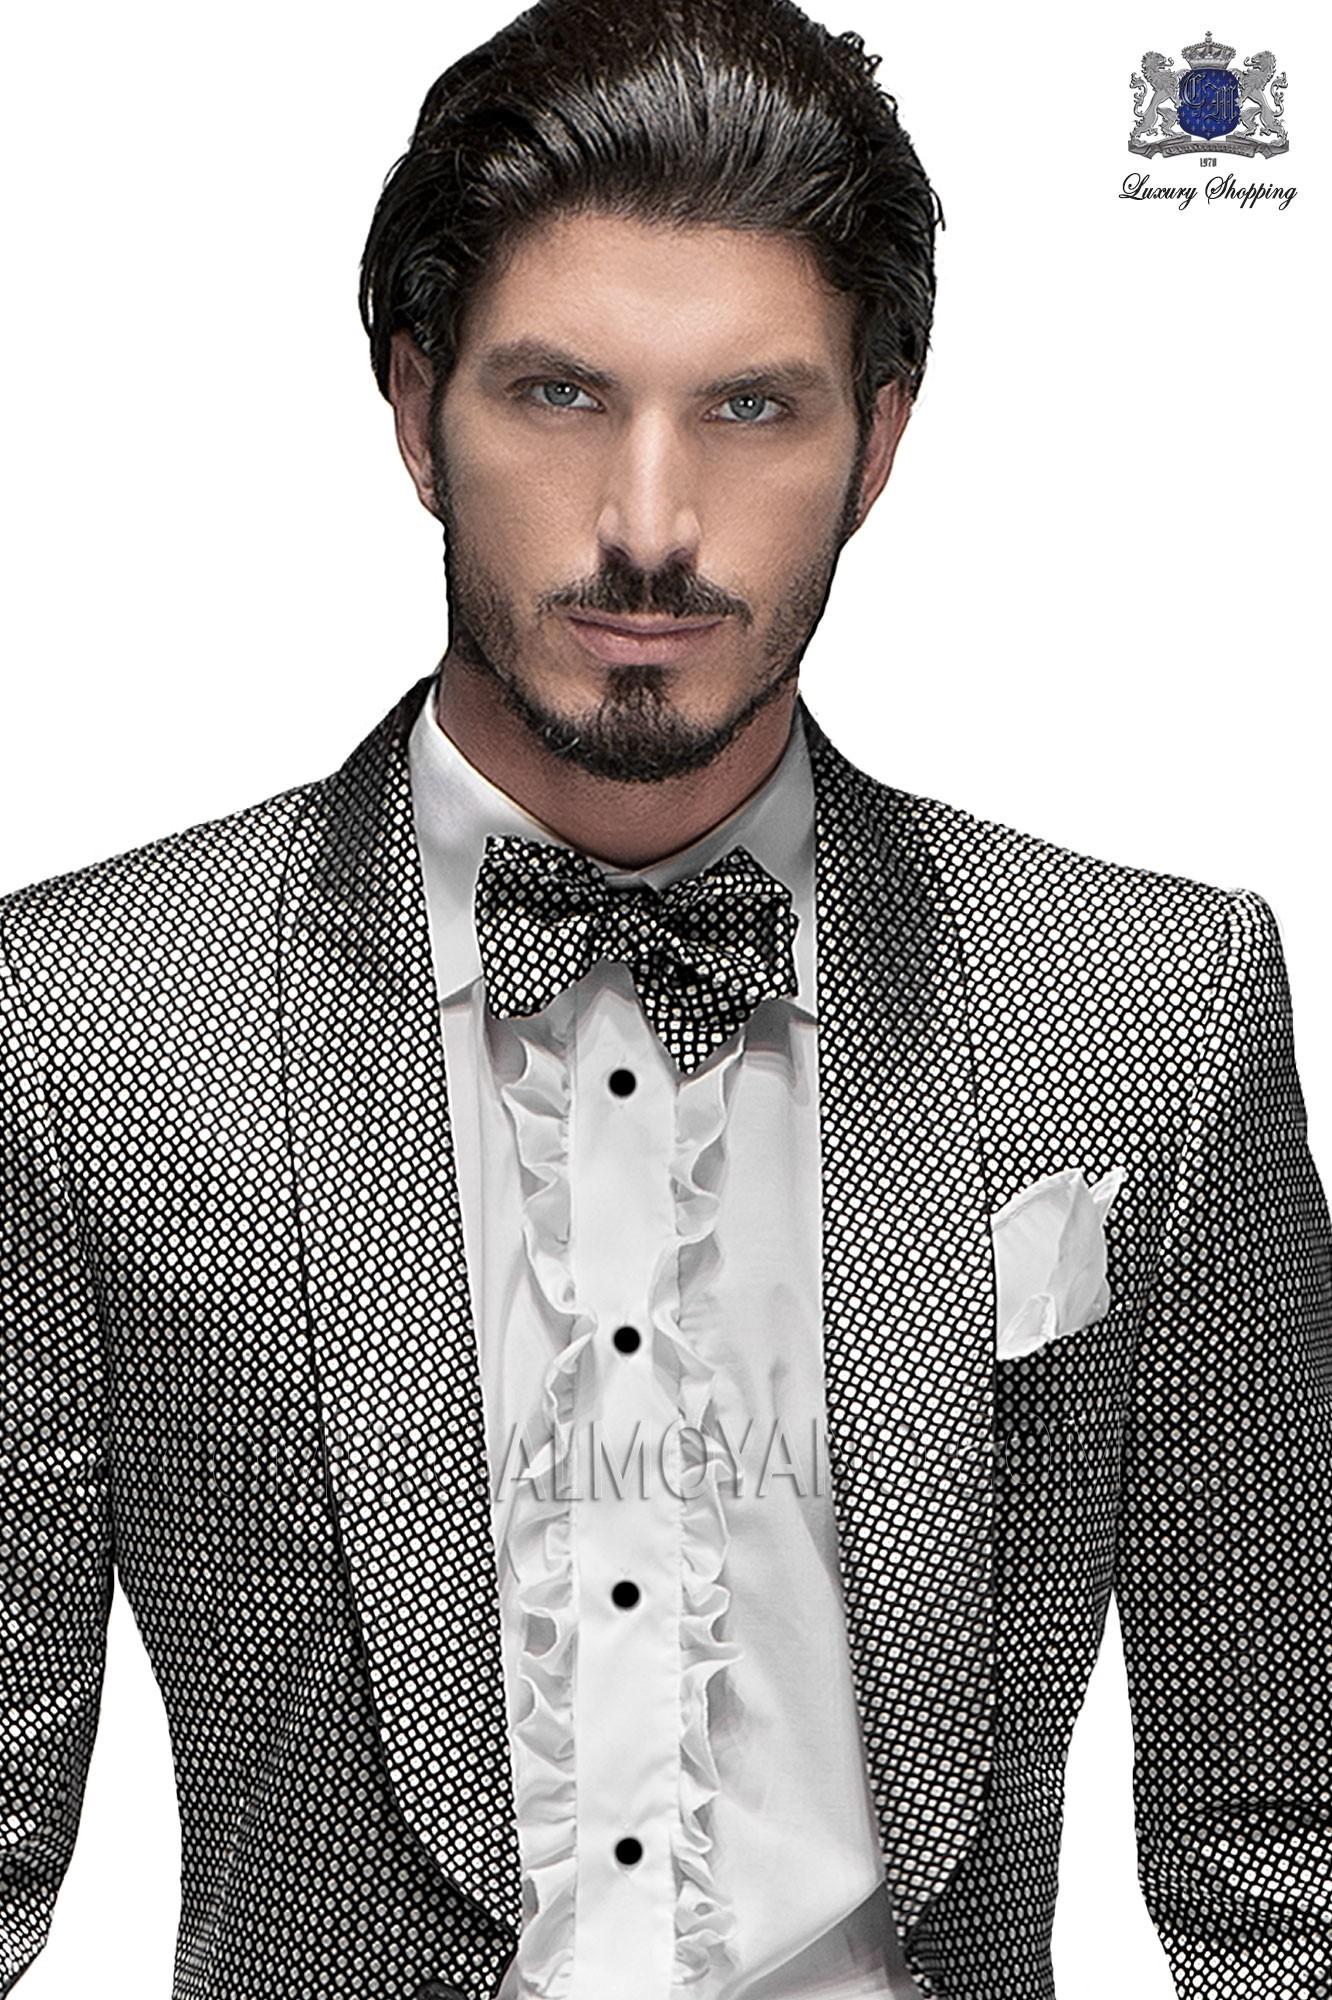 Italian emotion silver/ black men wedding suit, model: 60963 Ottavio Nuccio Gala Emotion Collection